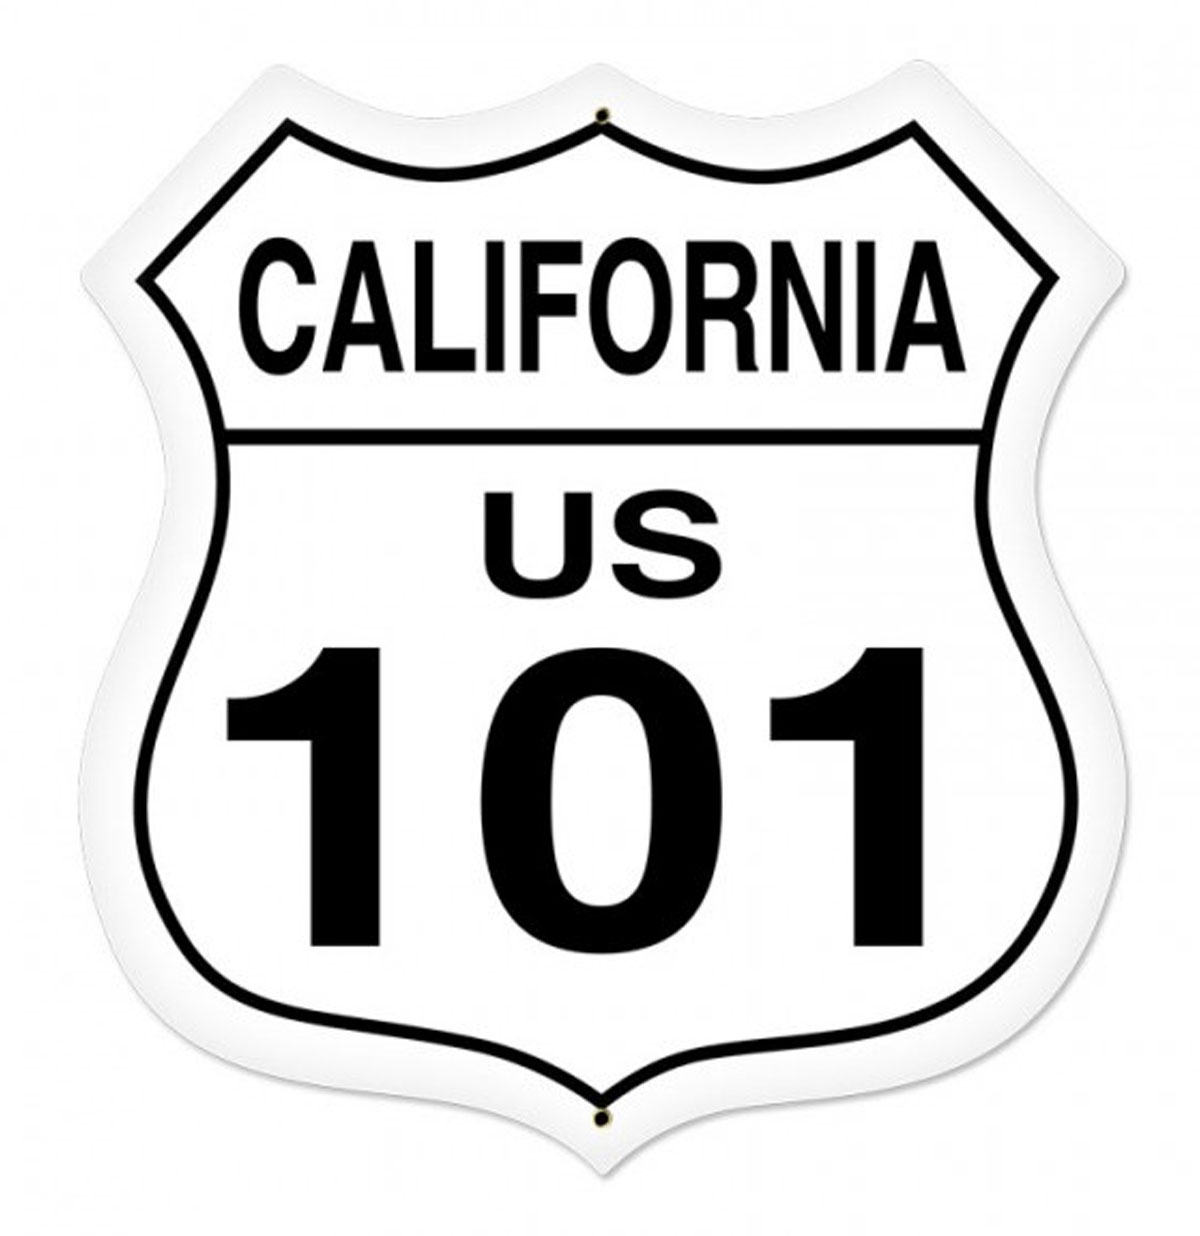 California Route 101 Zwaar Metalen Bord 70 x 70 cm